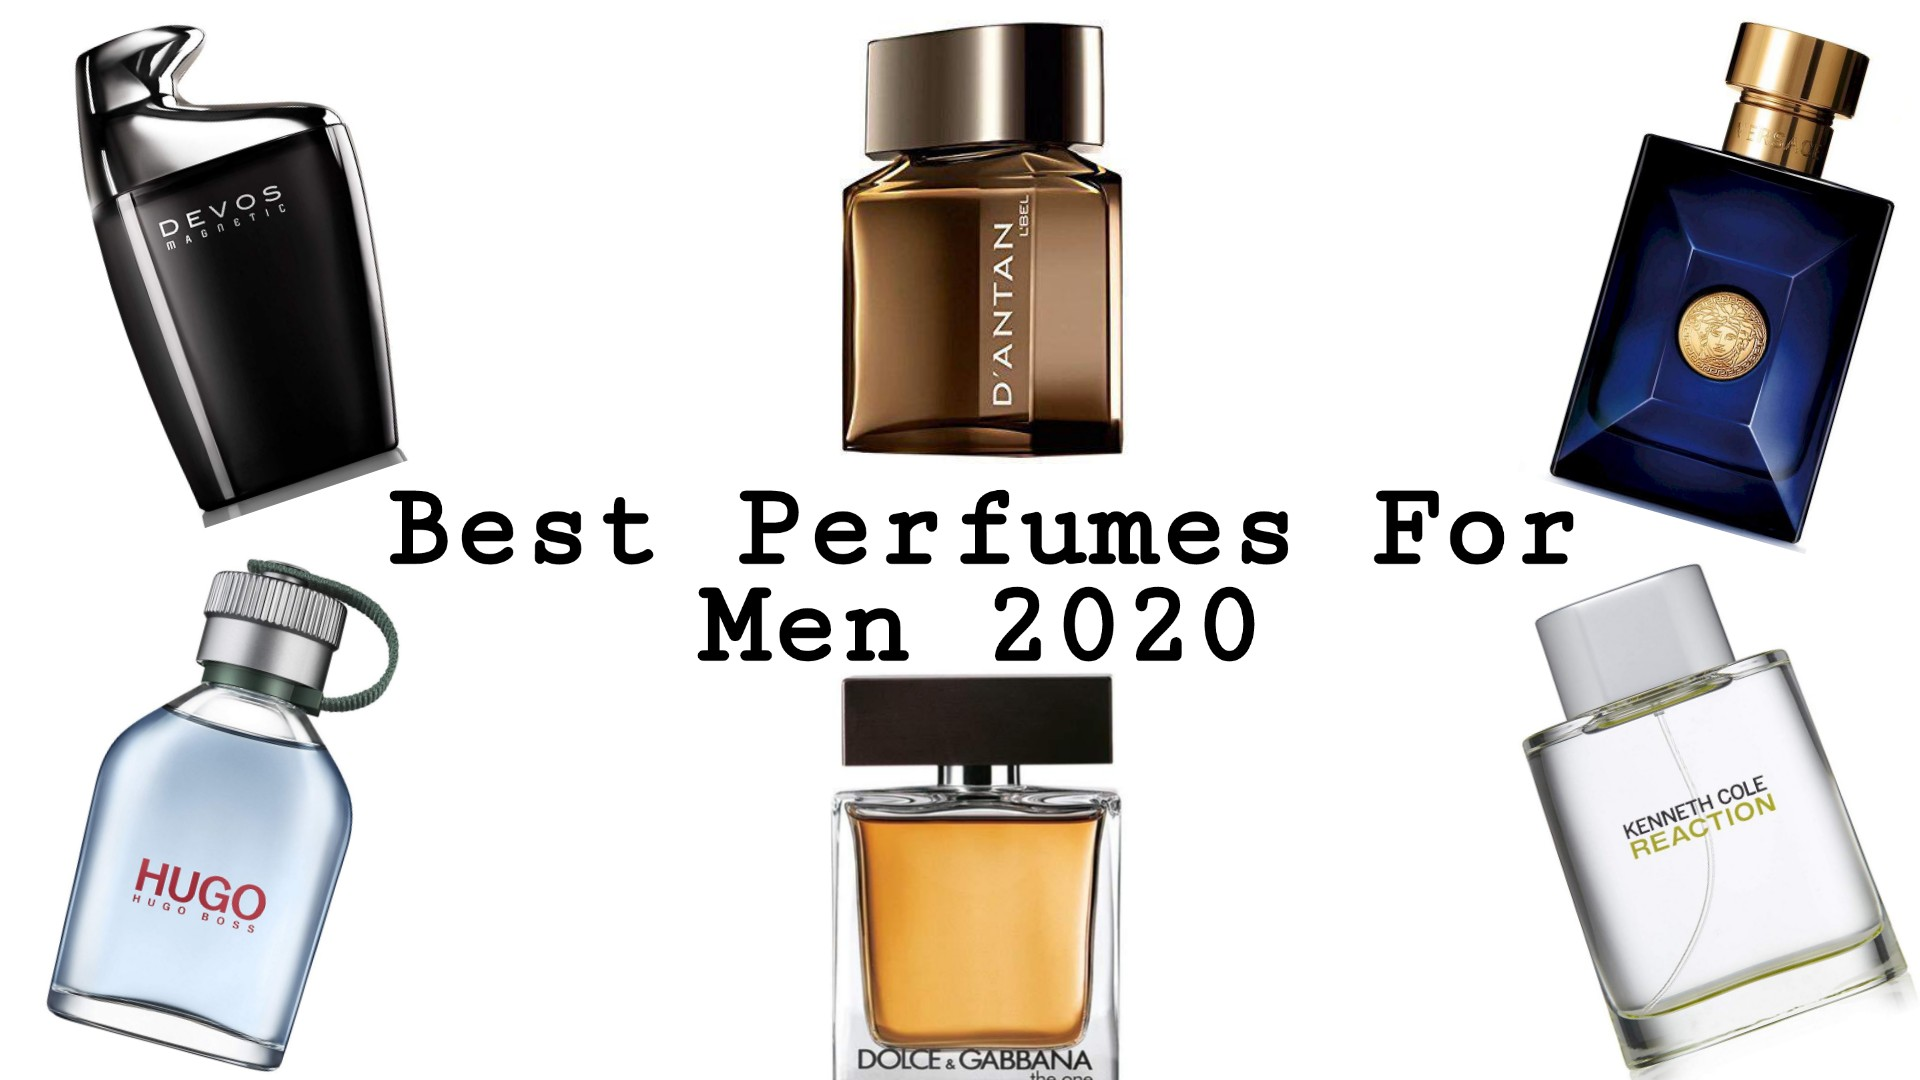 2020 Best Perfumes for Men